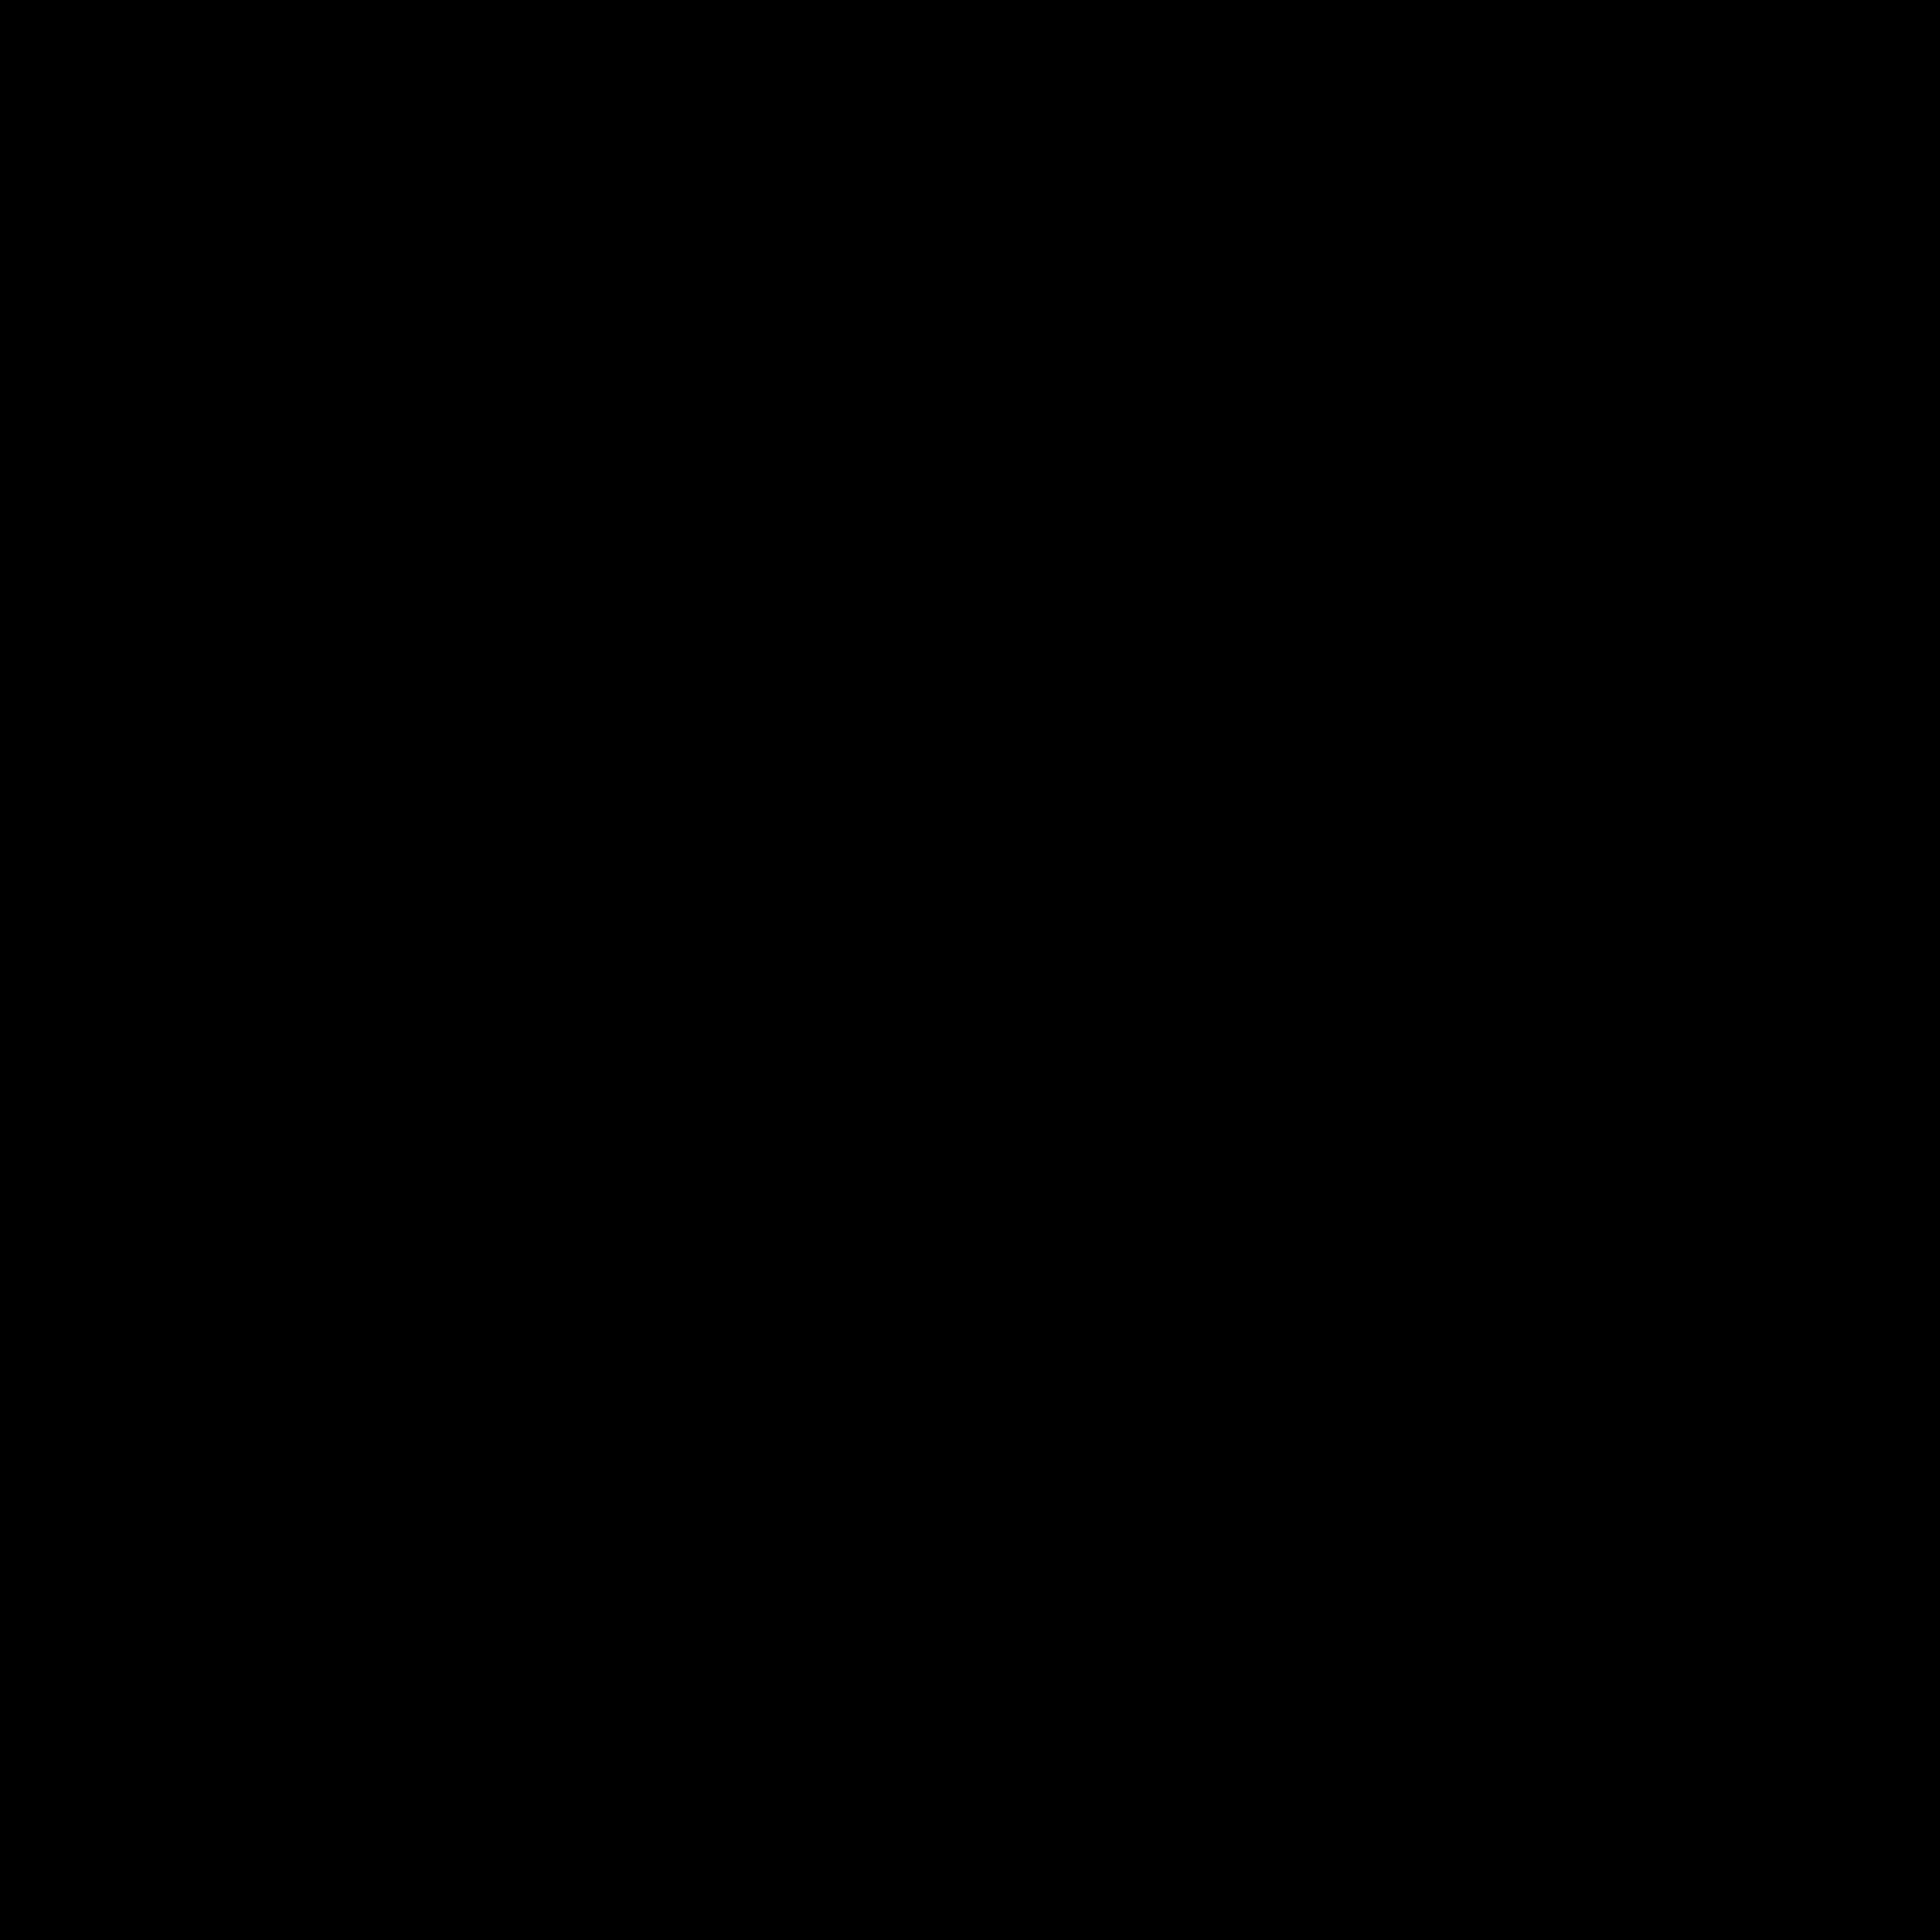 Winn Logo PNG Transparent & SVG Vector - Freebie Supply